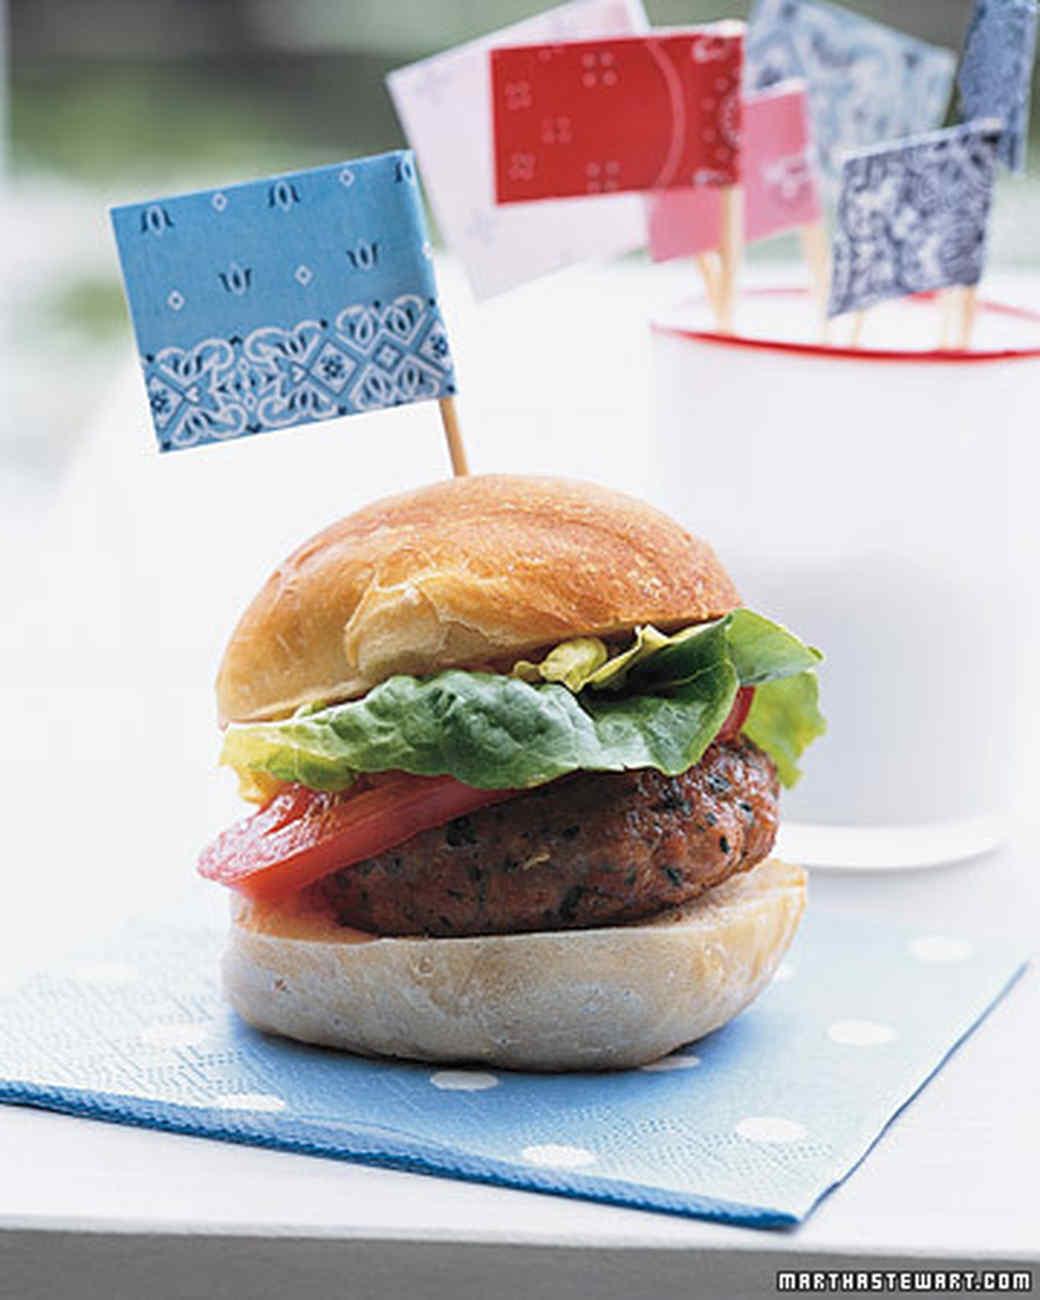 mla102496_0707_burger.jpg